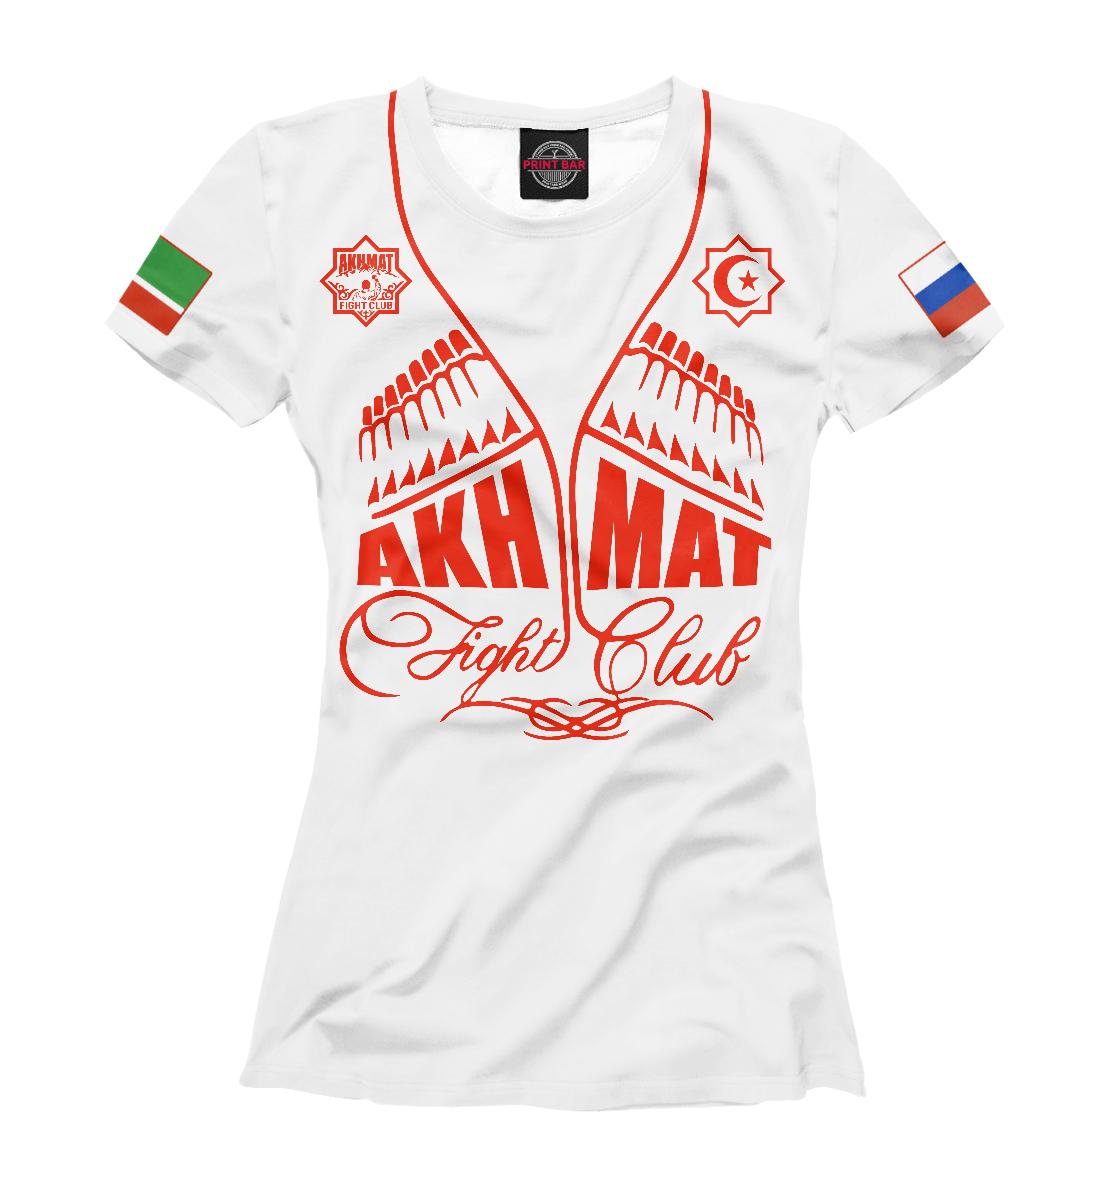 Купить Fight Club Akhmat White, Printbar, Футболки, AFC-571782-fut-1